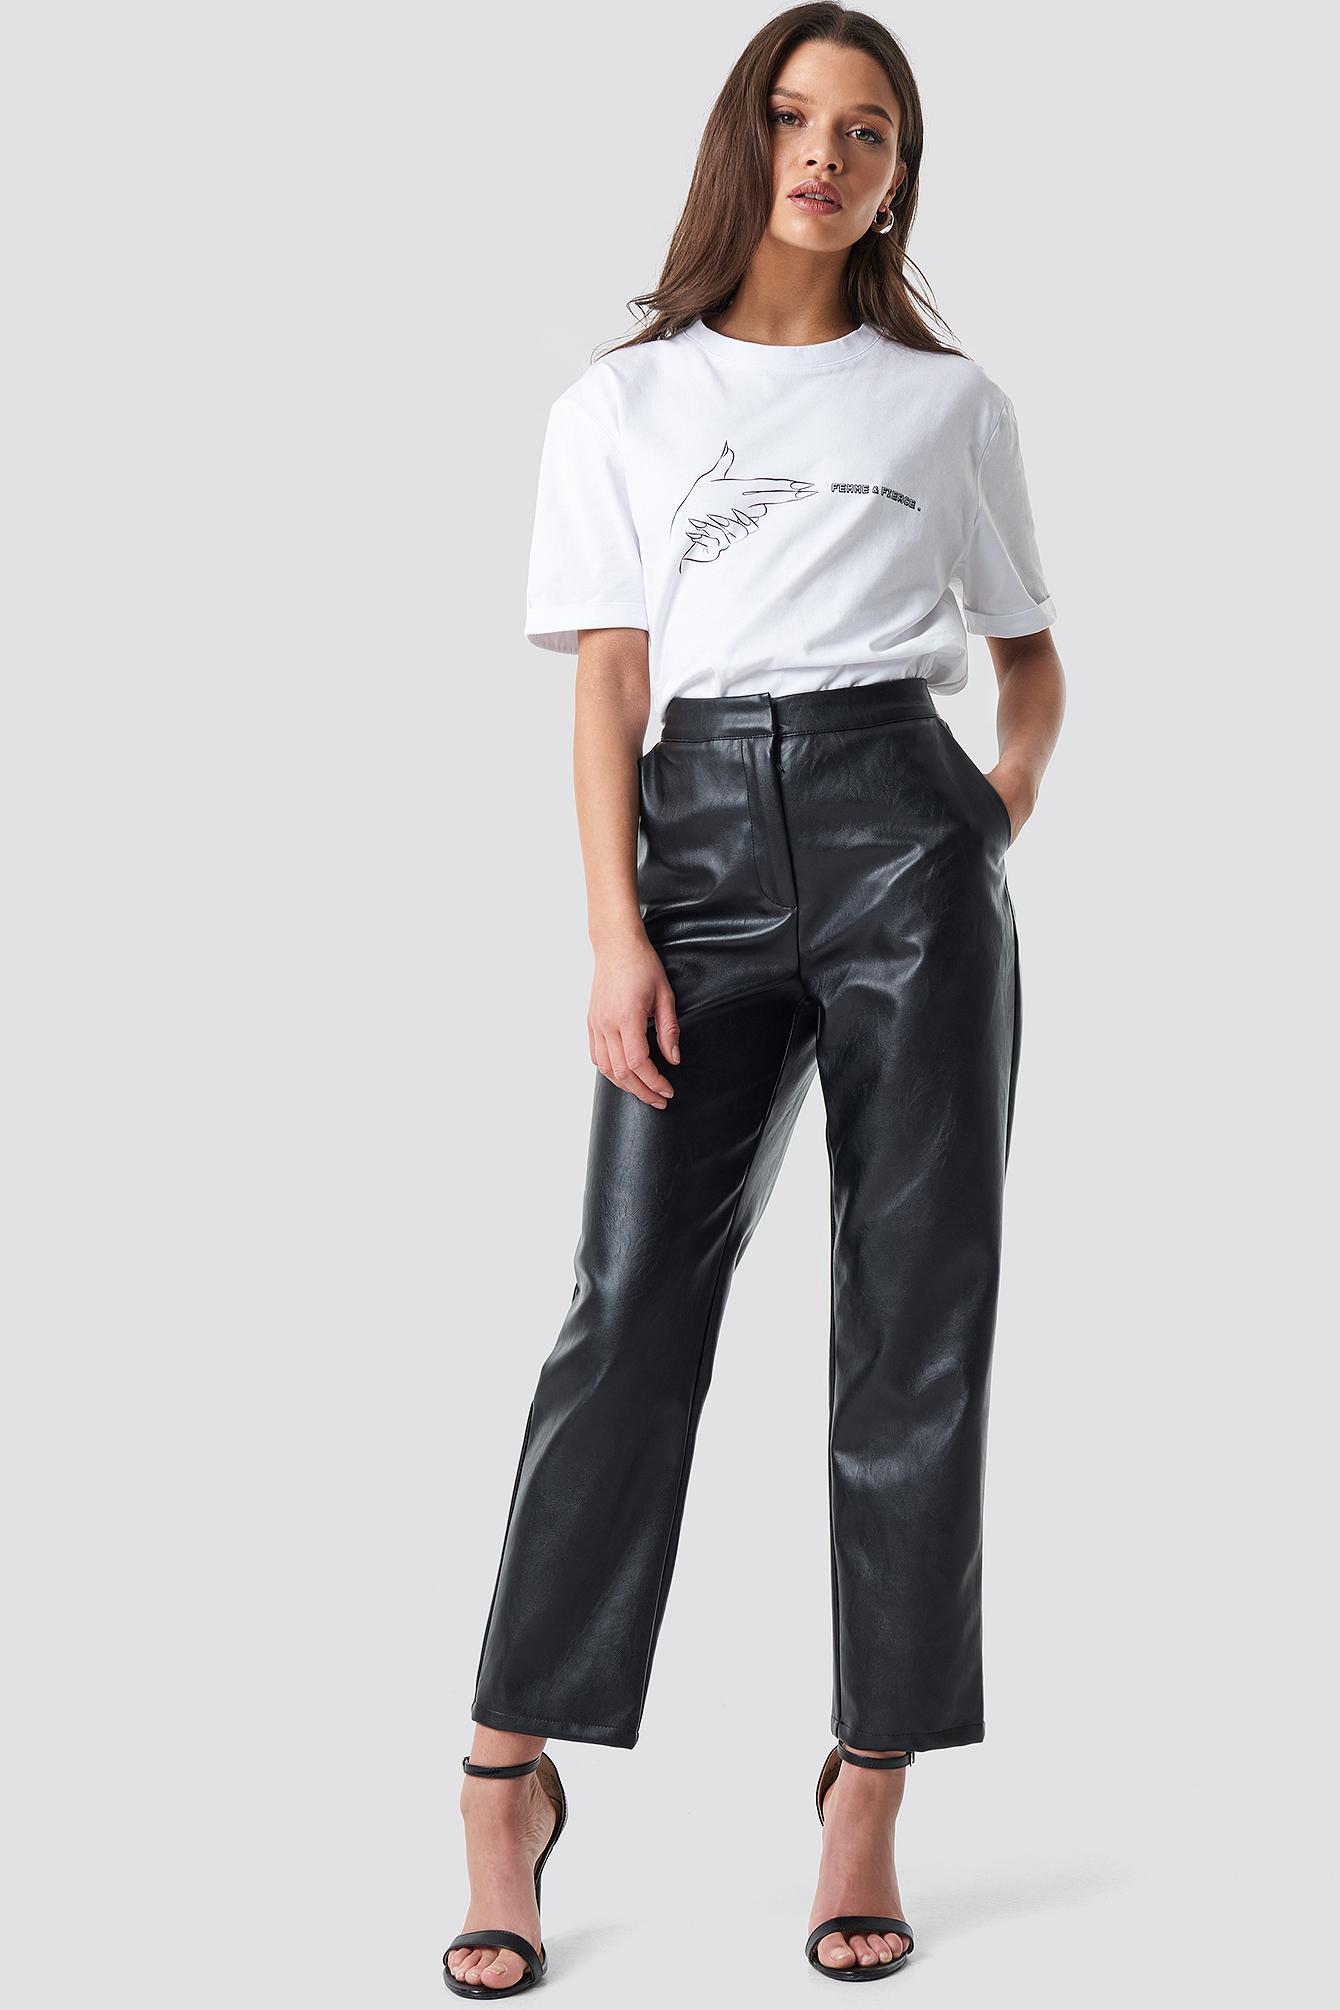 linn ahlborg x na-kd -  PU Leather Pants - Black